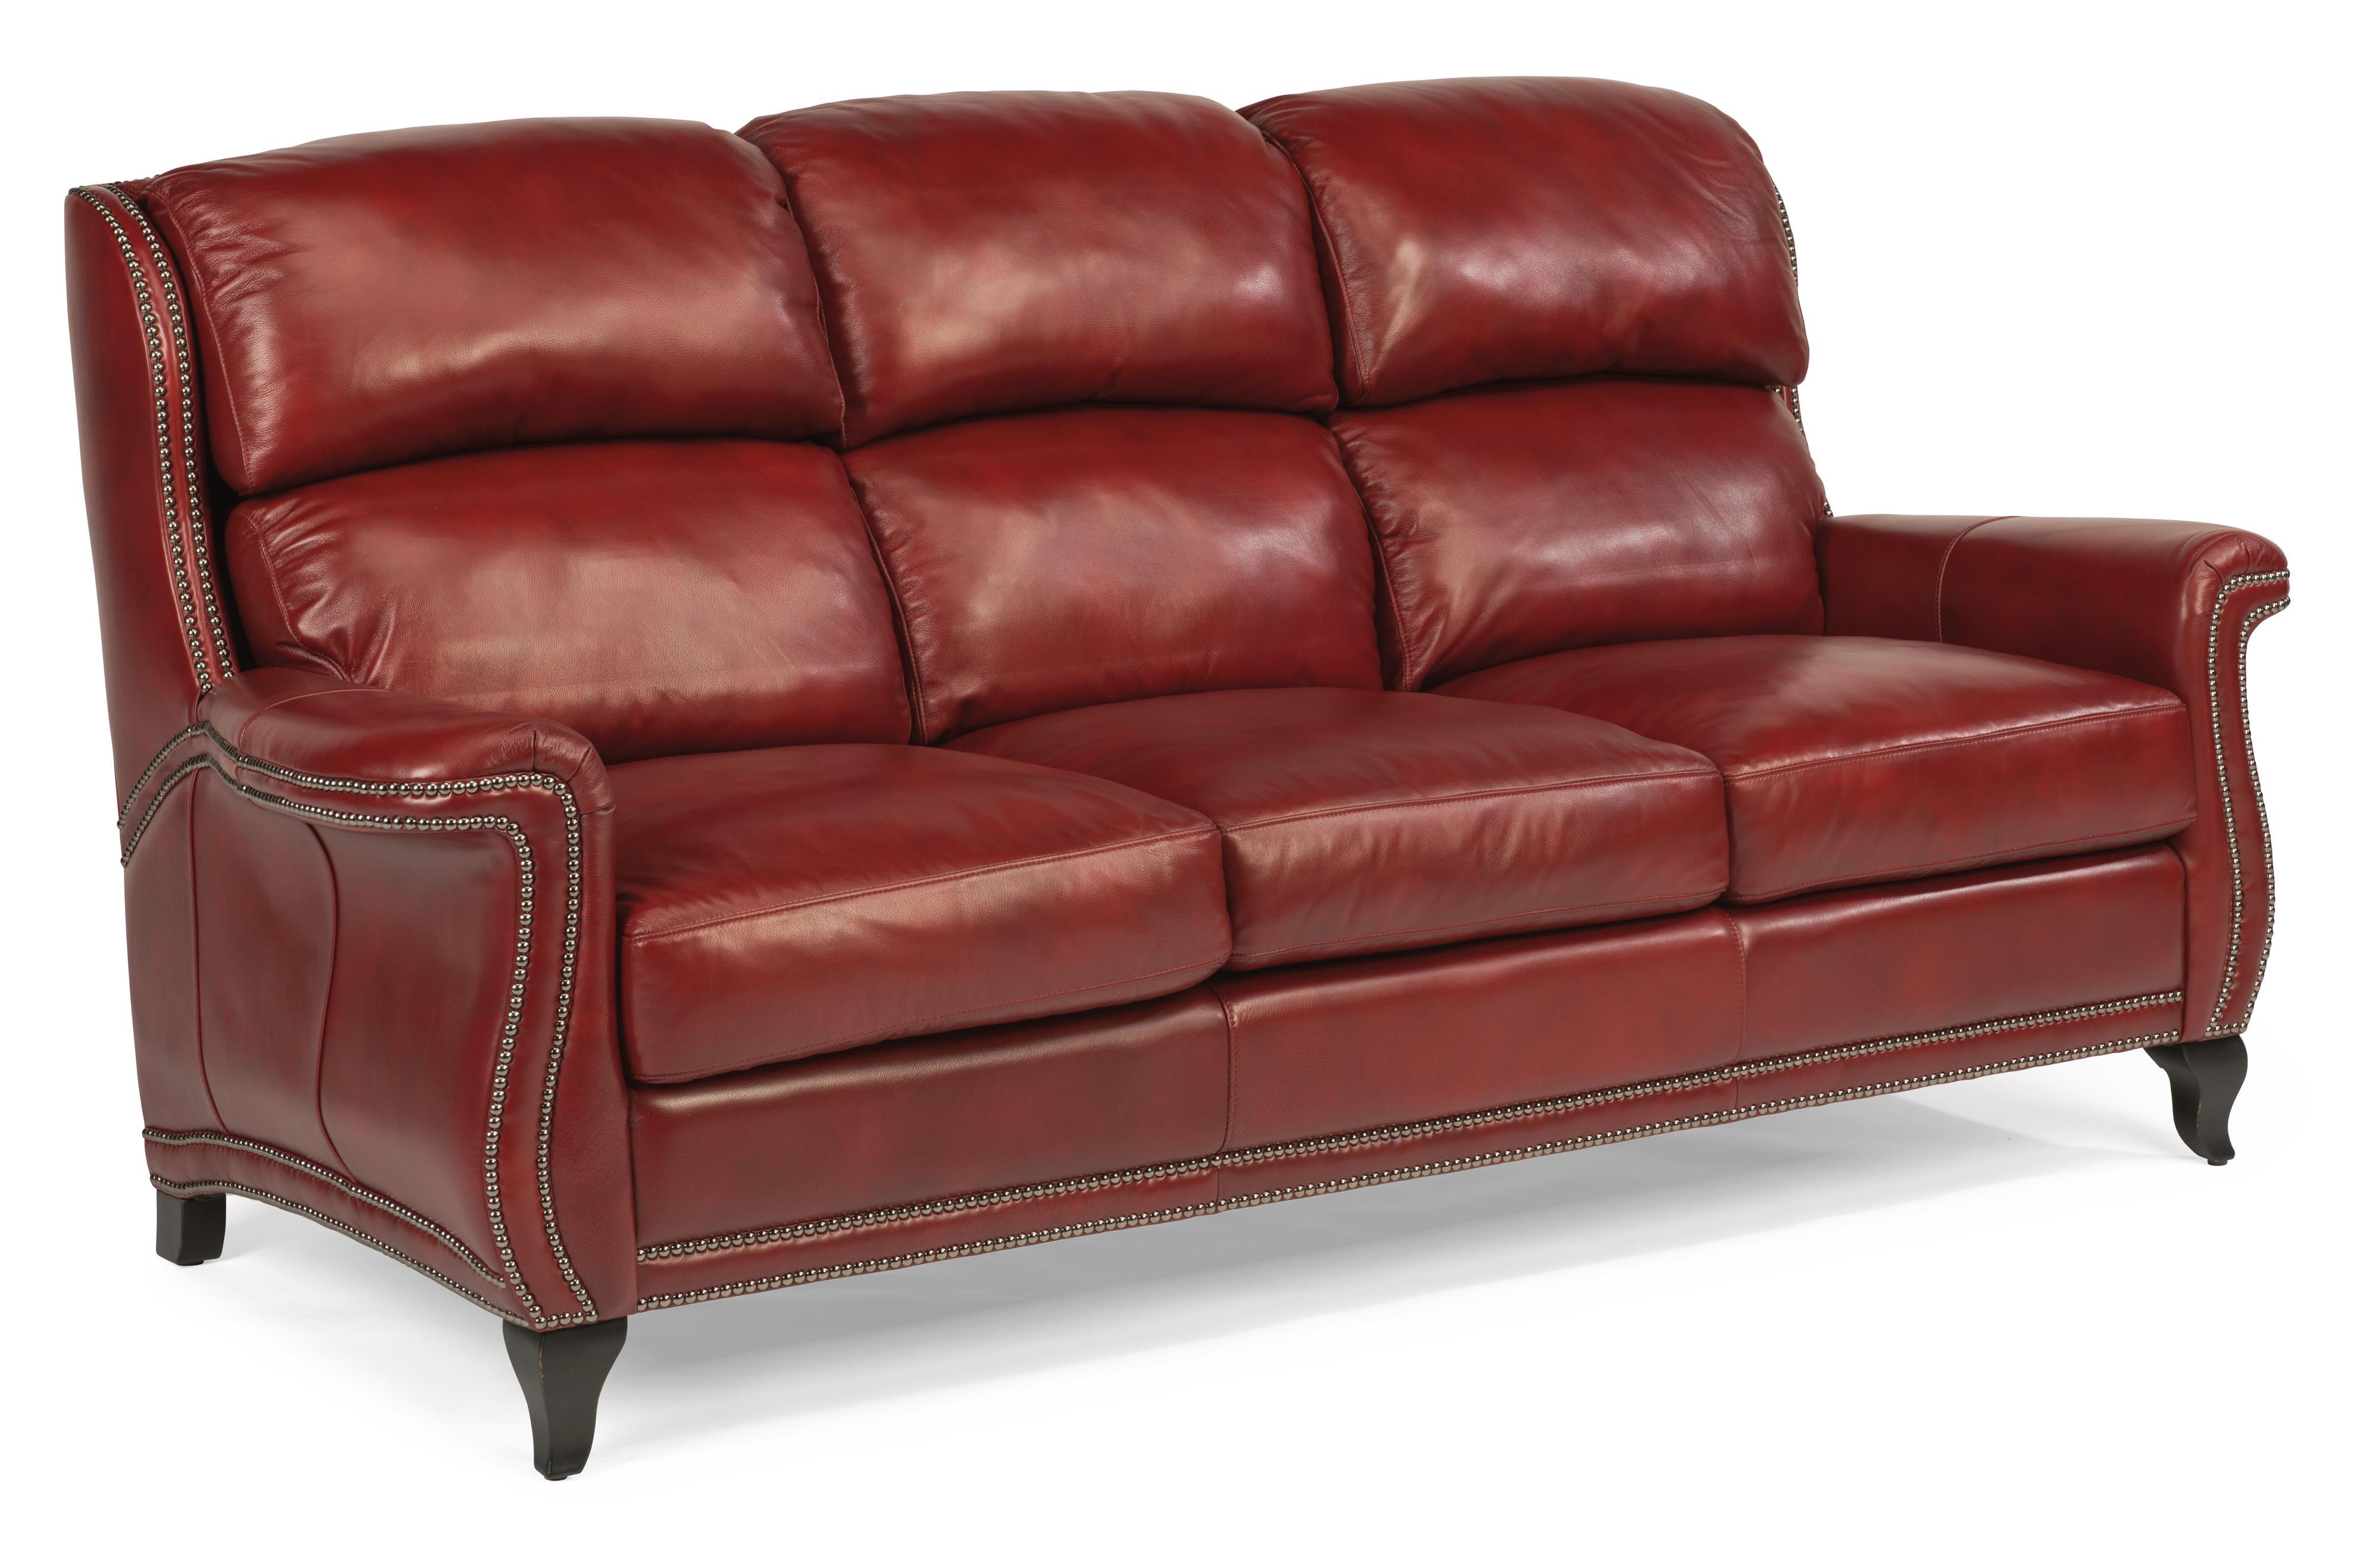 Flexsteel Latitudes-Sting Ray Sofa - Item Number: 1256-31-LSP-55